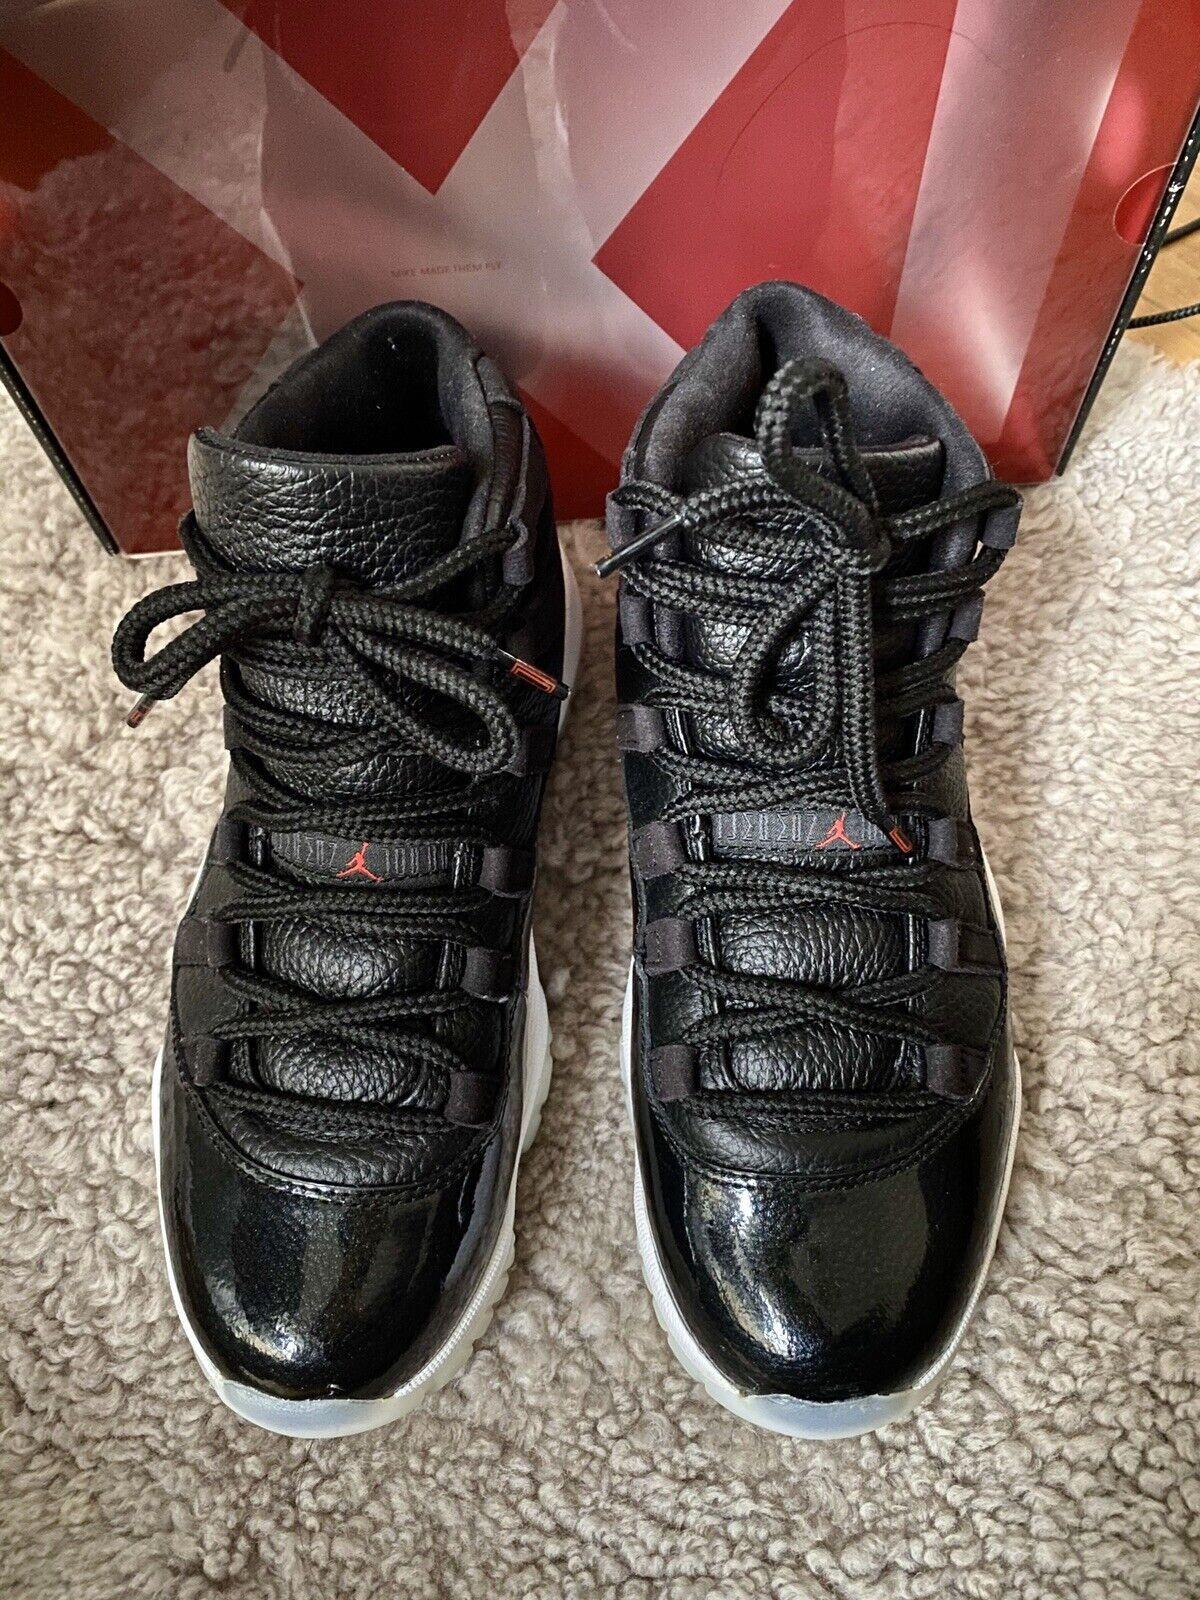 Nike Air Jordan XI Retro 11 72-10 Size 6 Uk Size 7 US With Box! Concord Bred